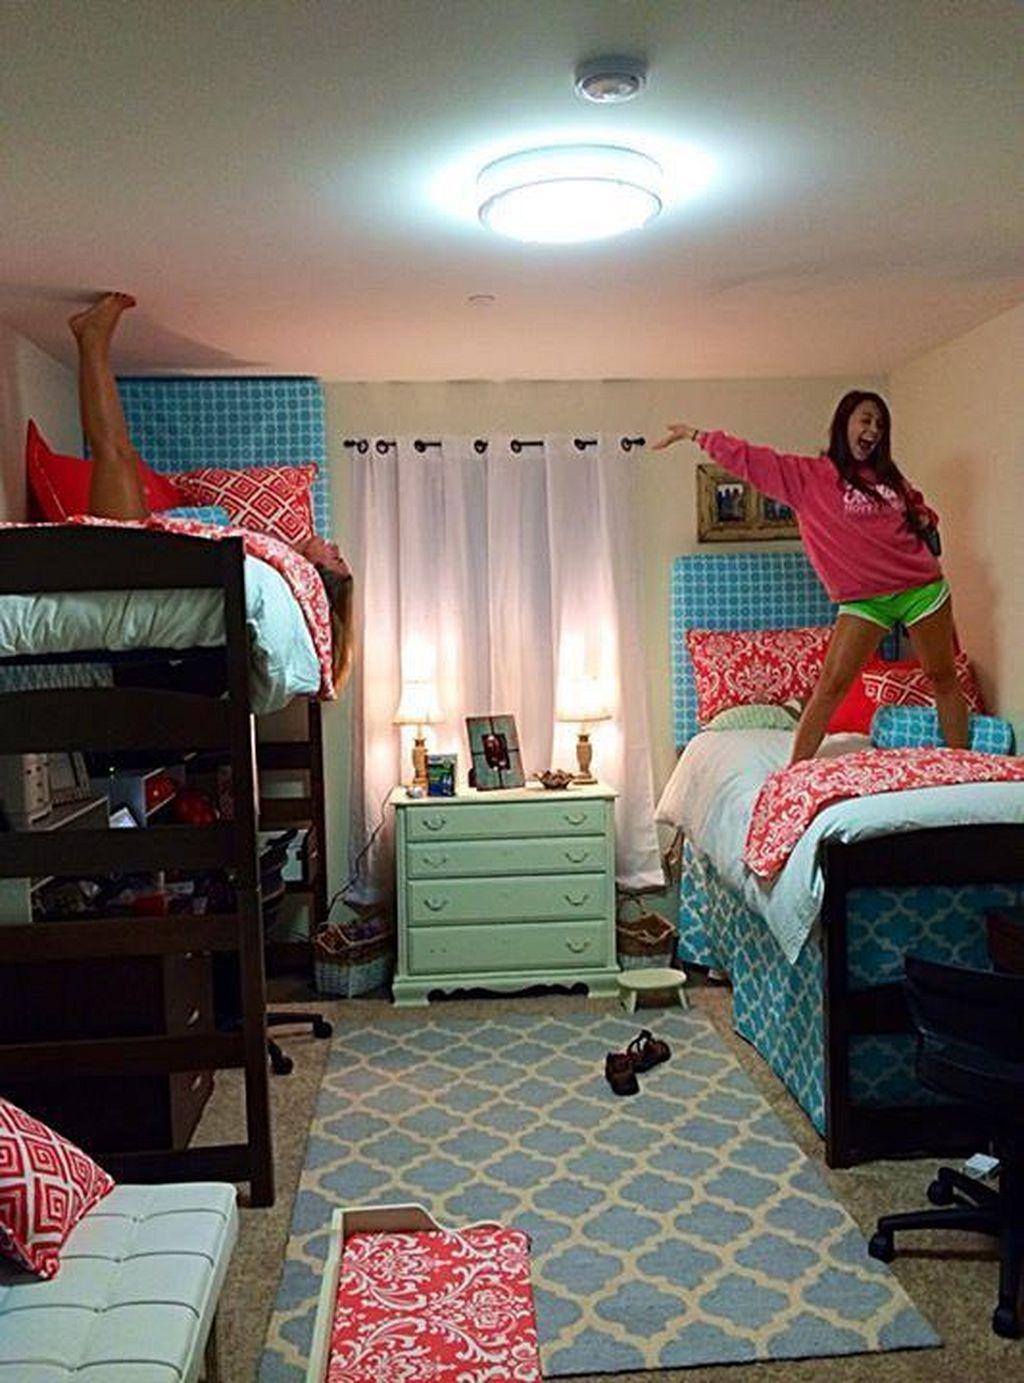 Cute loft bed ideas  Incredible and Cute Dorm Room Decorating Ideas  Dorm room ideas